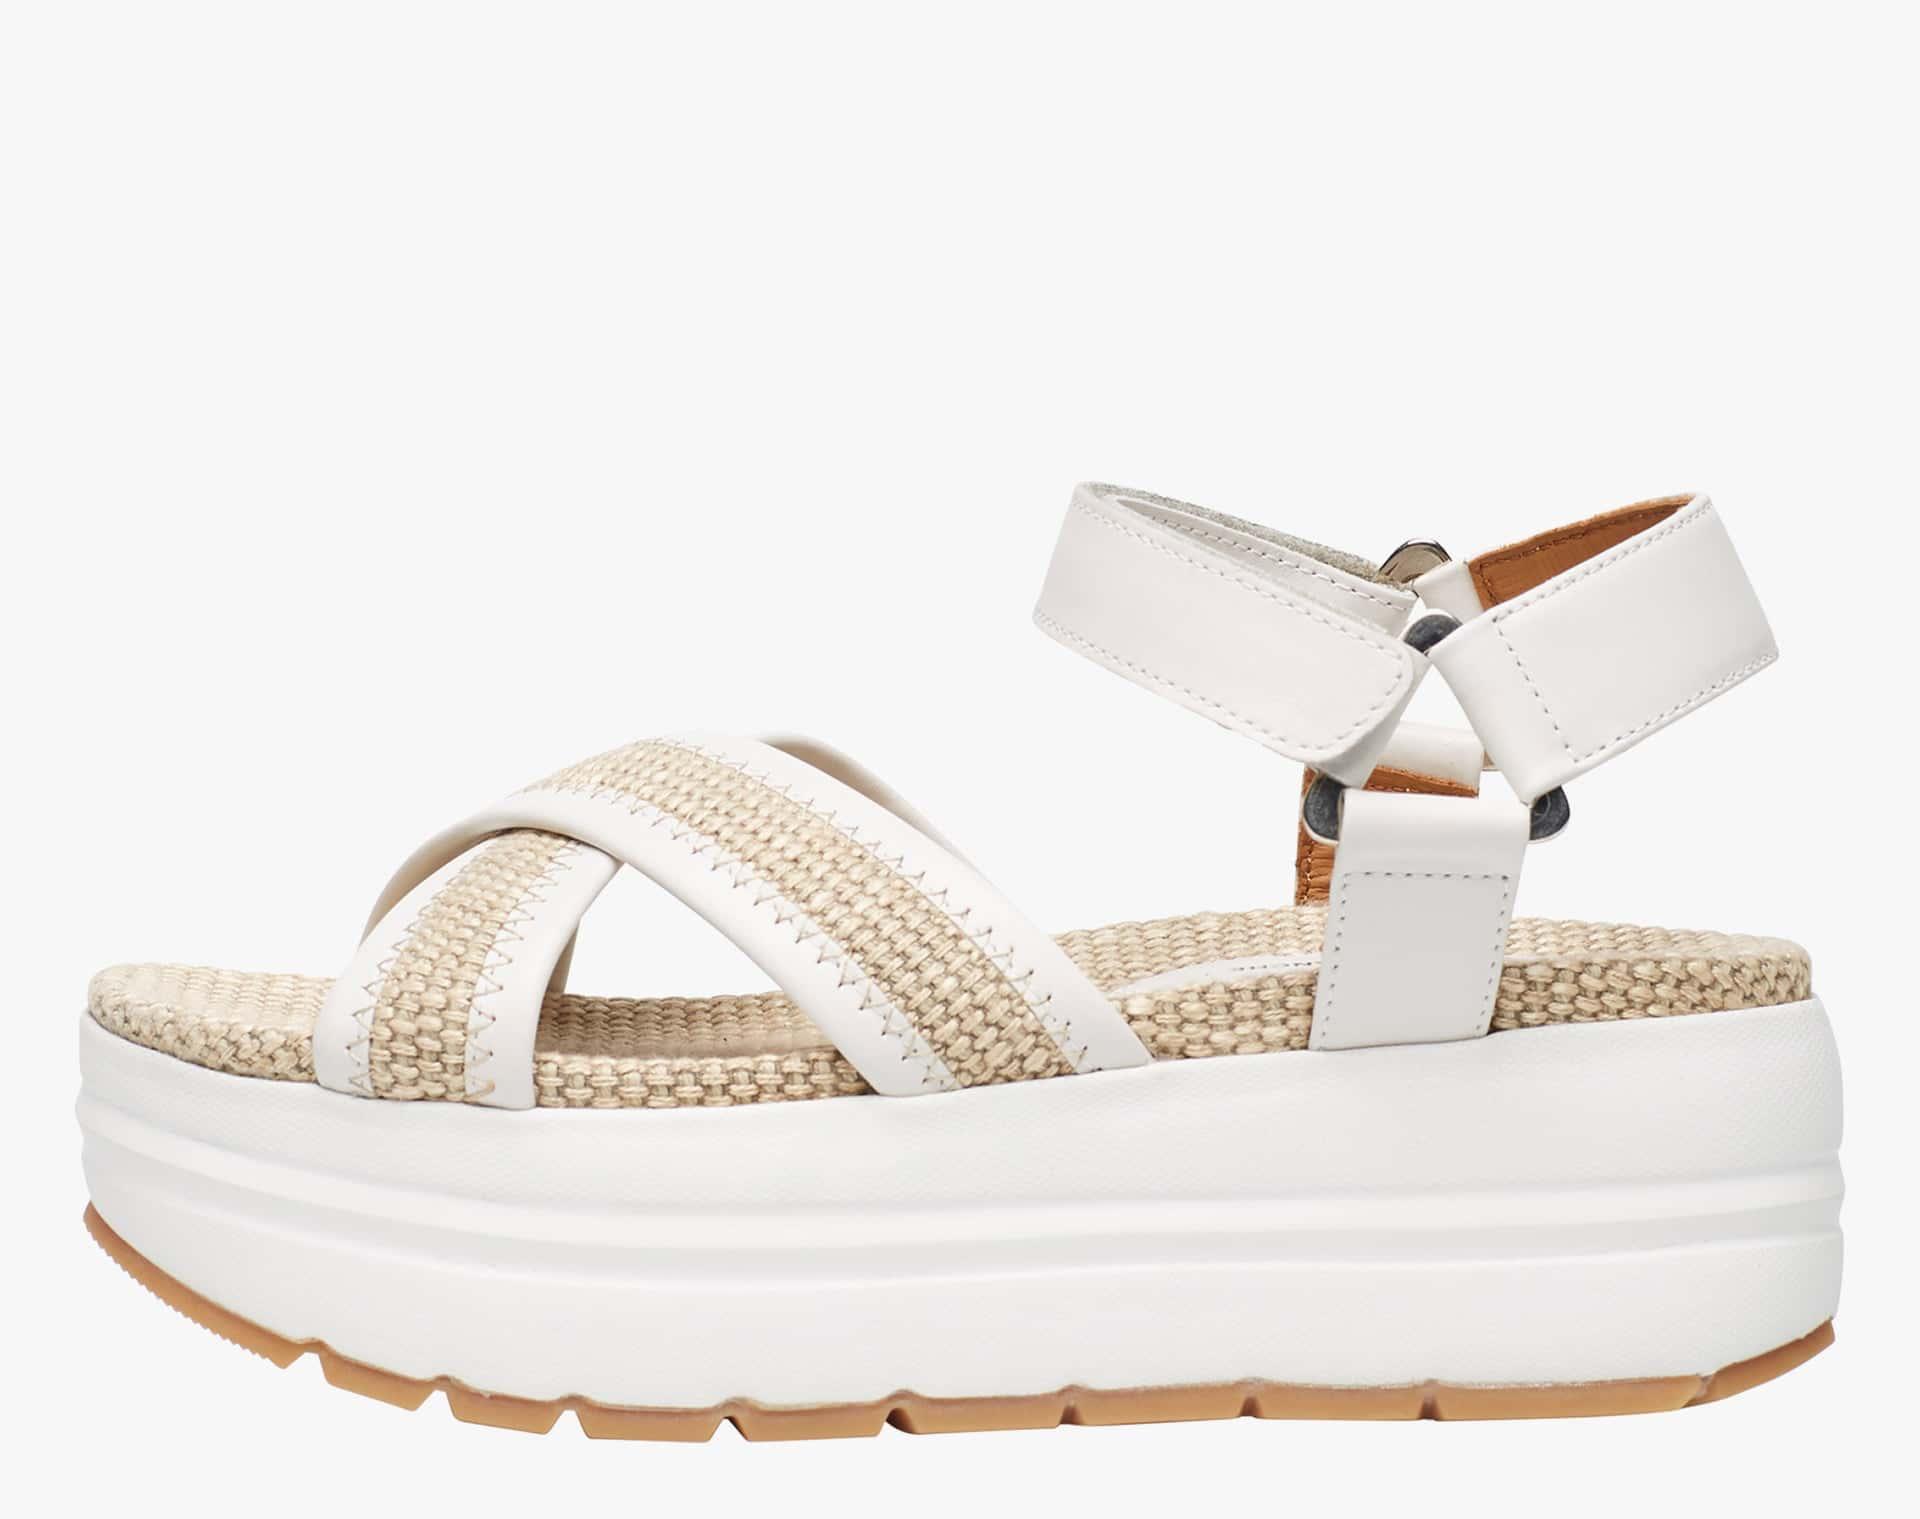 Sandalo in rafia e pelle con suola chunky Bianco-SELENA